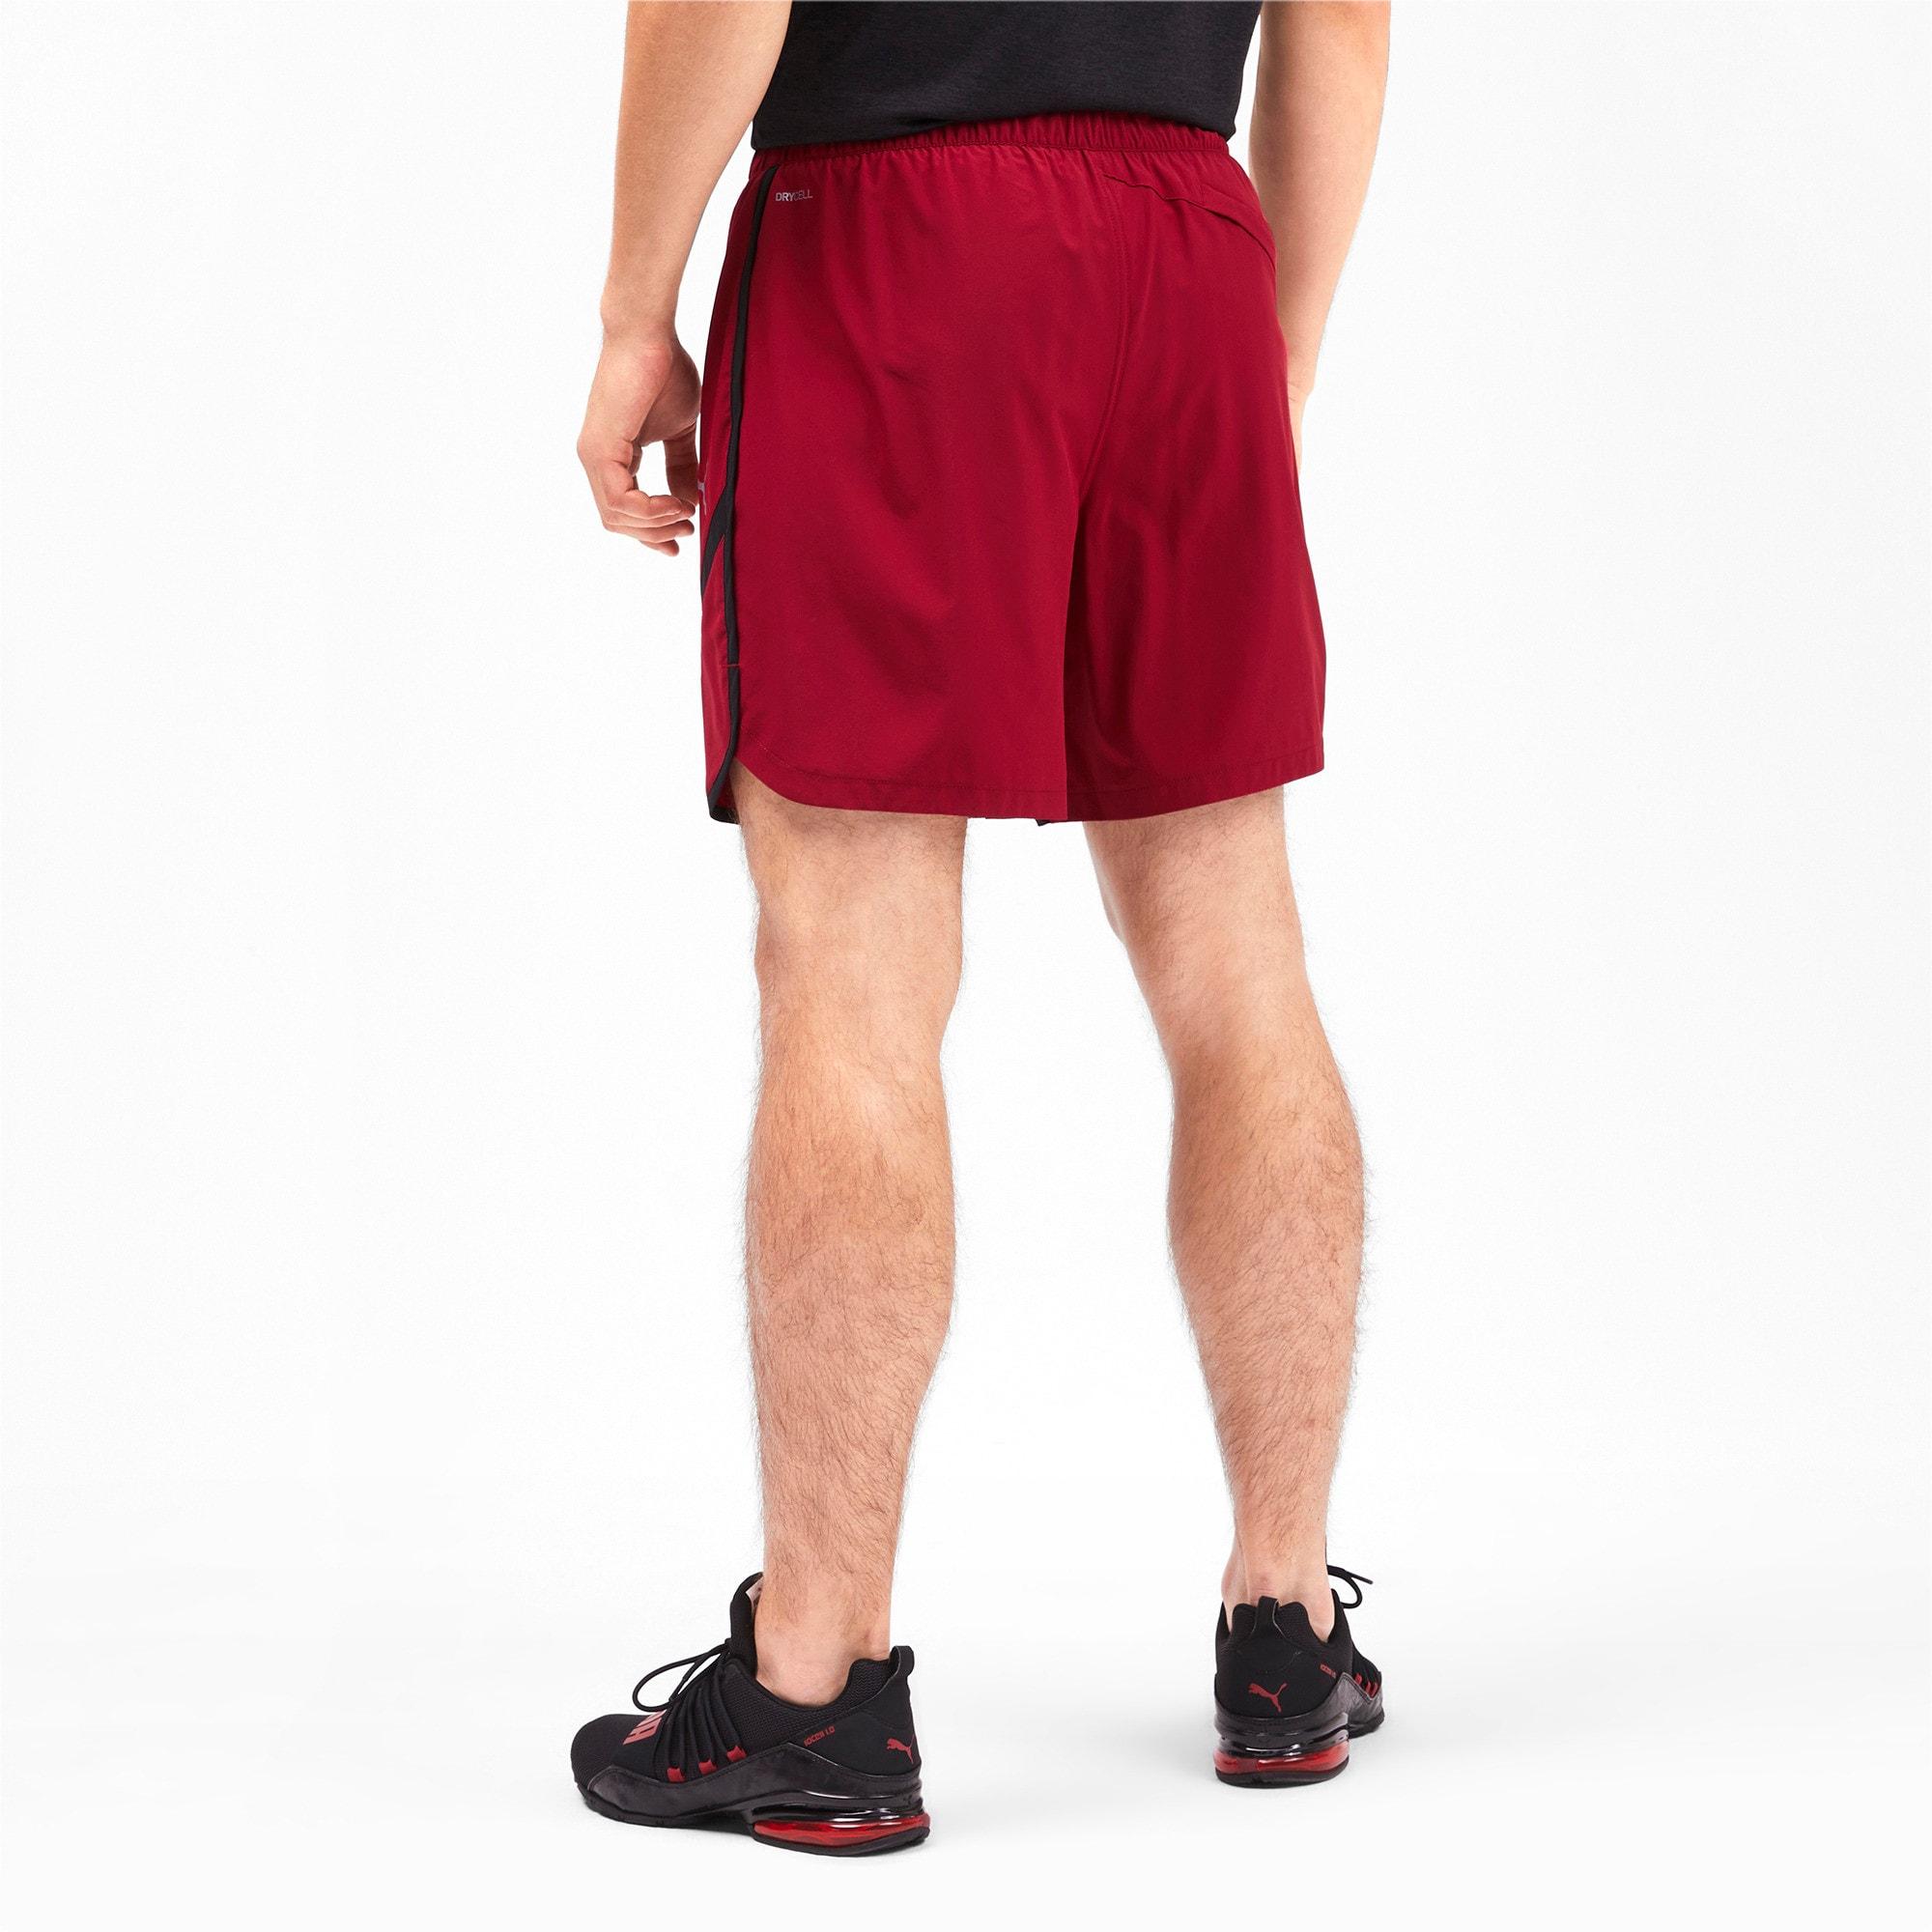 Thumbnail 2 of Get Fast Men's Shorts, Rhubarb-Puma Black, medium